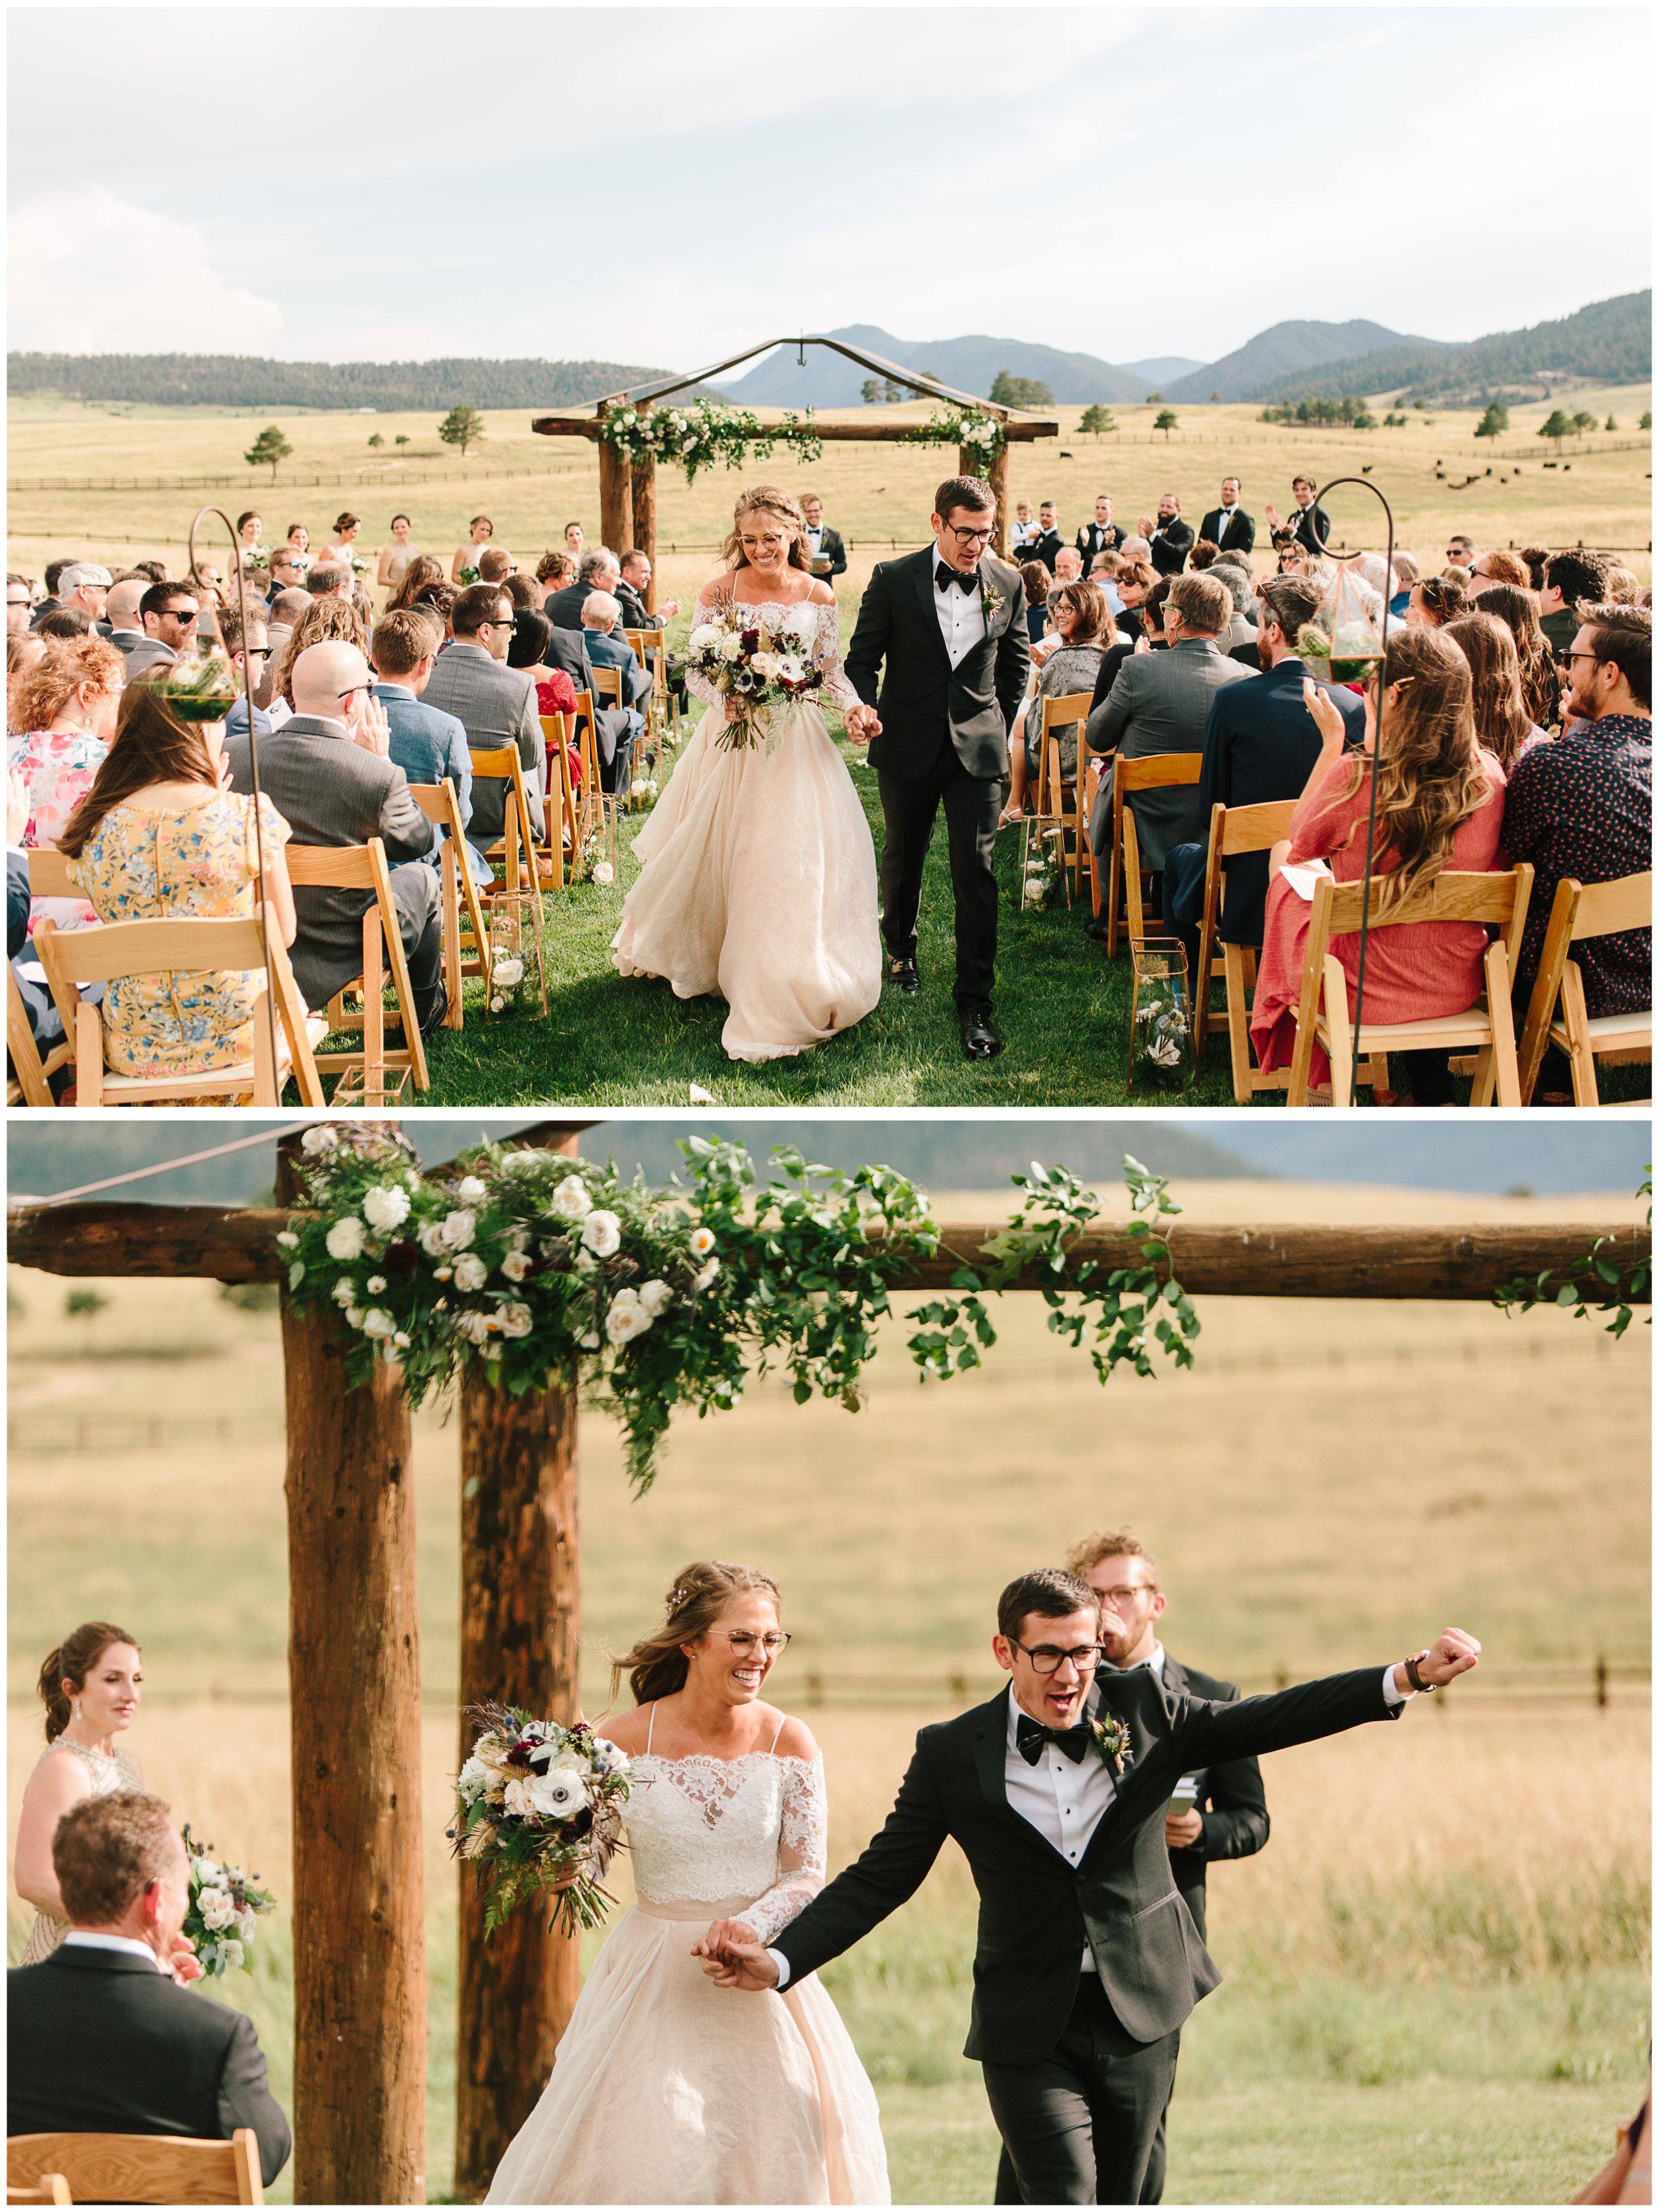 spruce_mountain_ranch_wedding_57.jpg